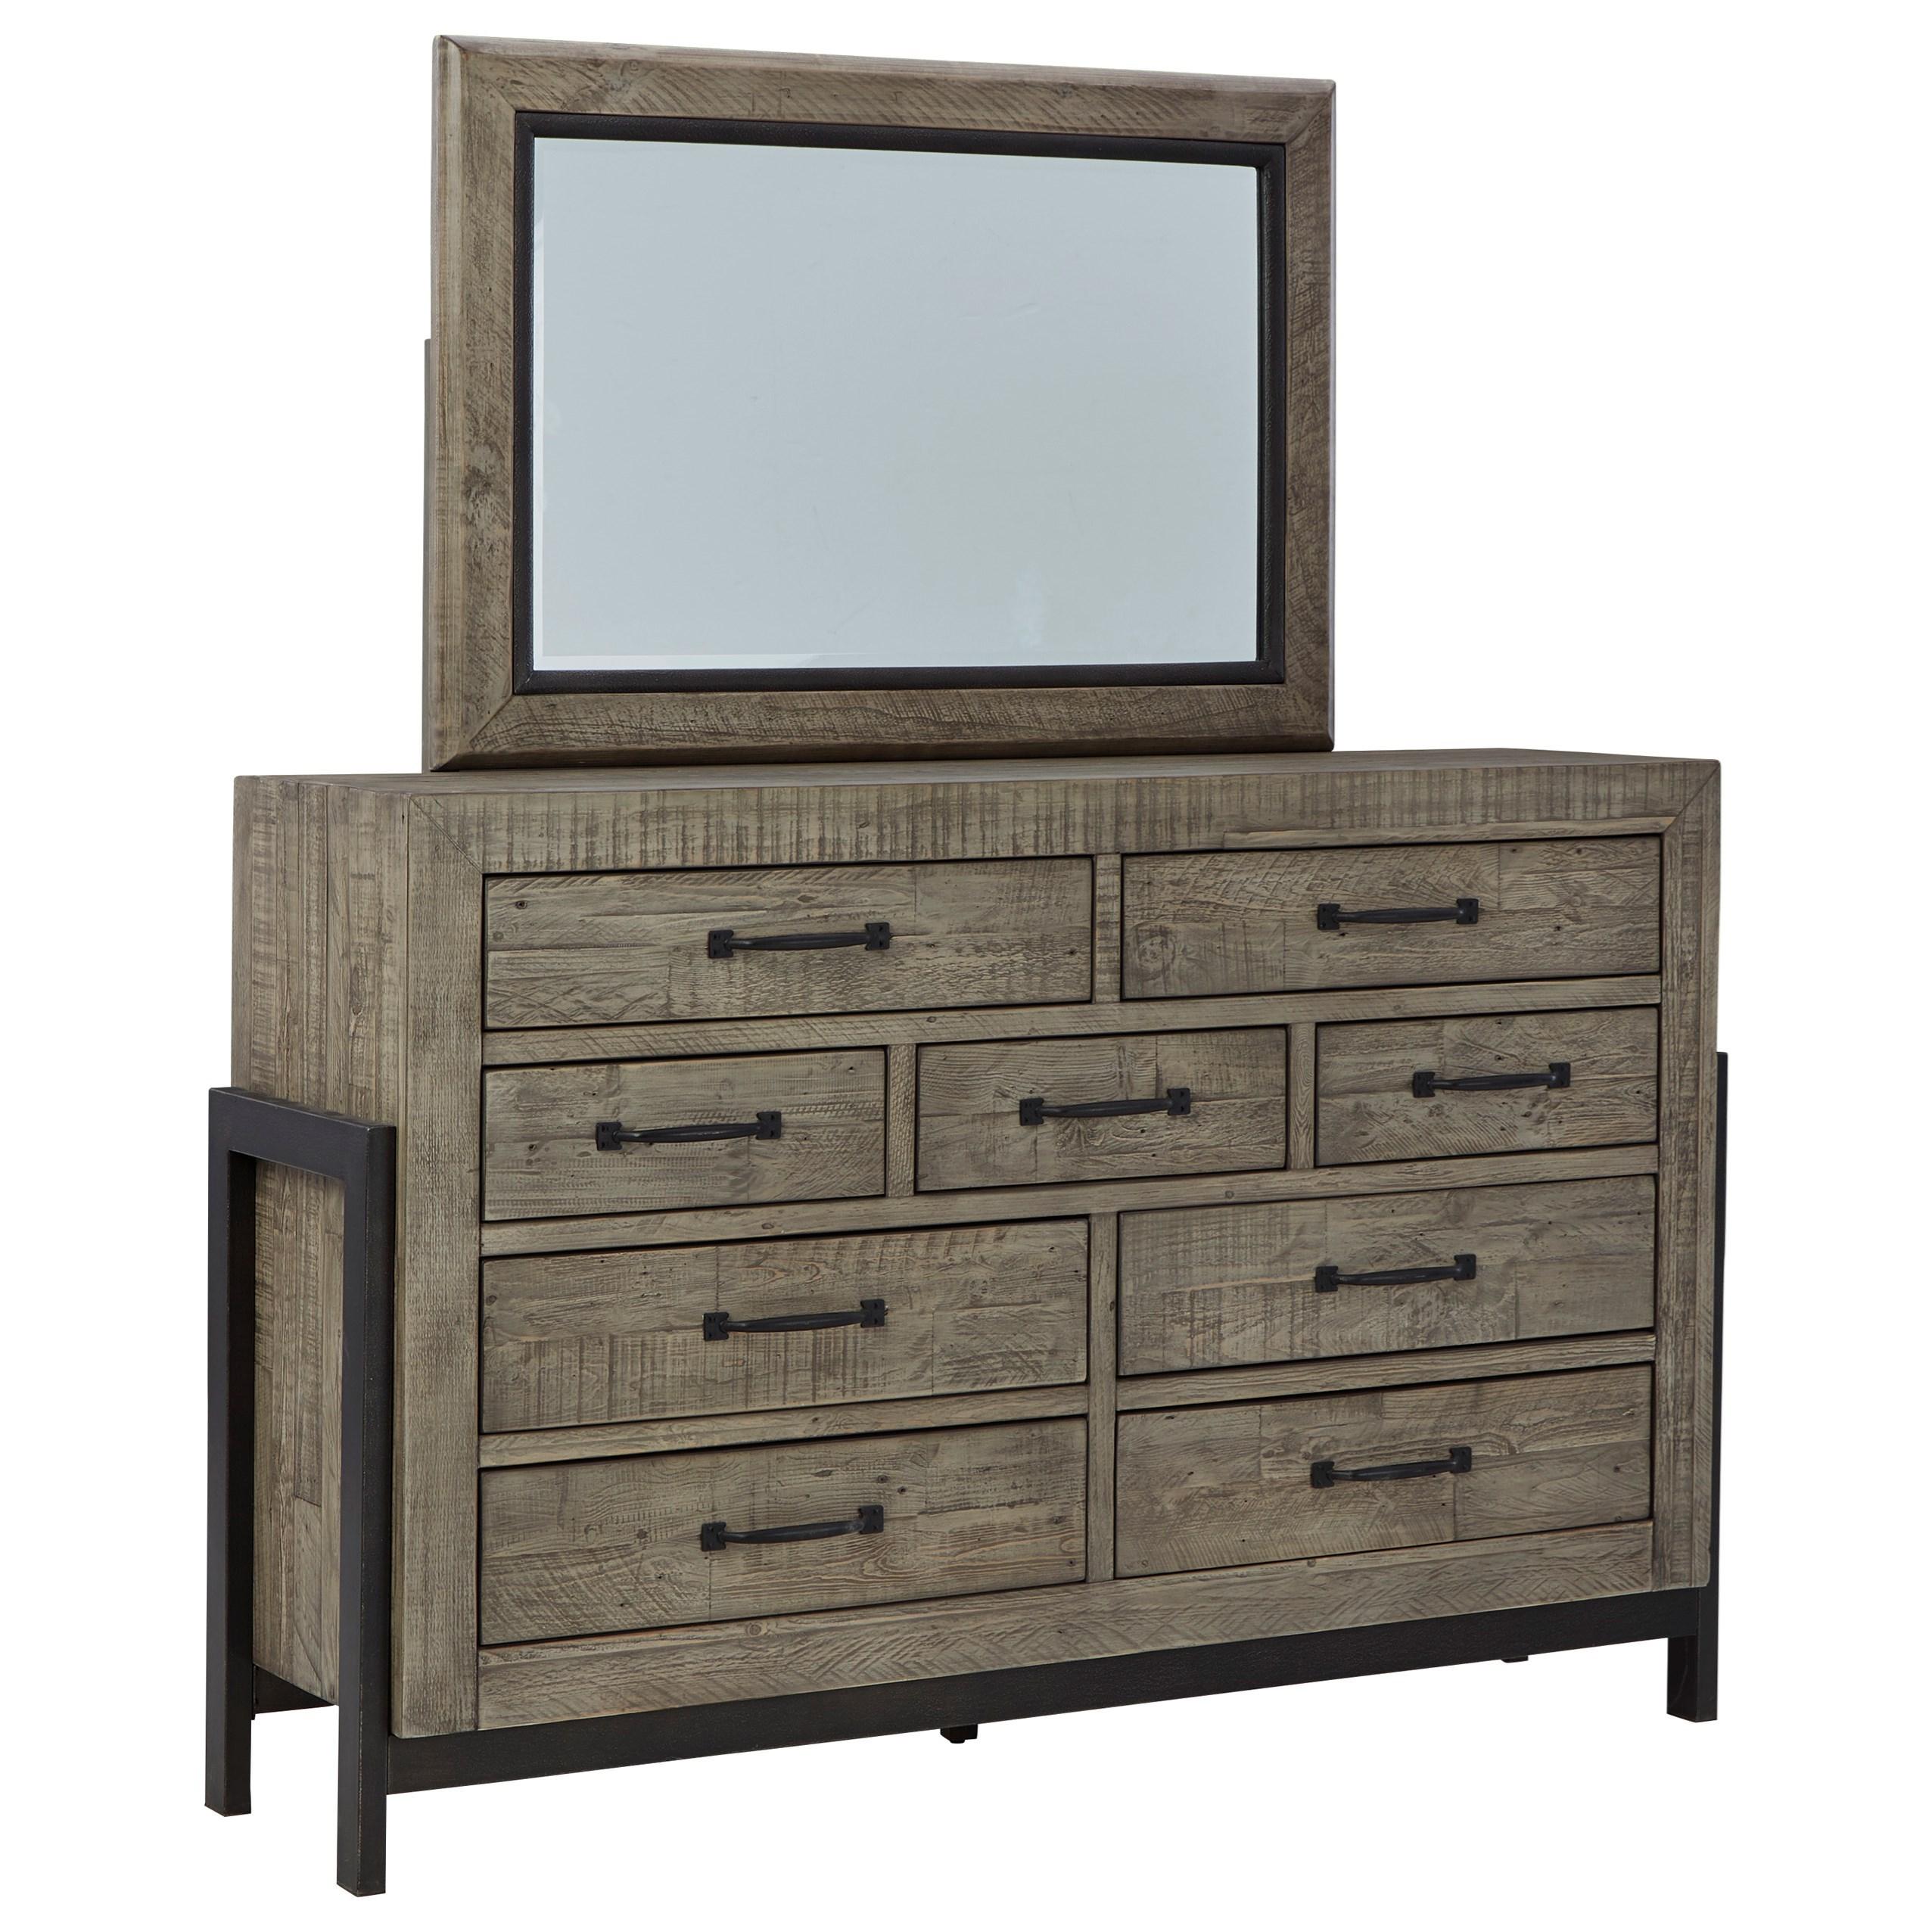 Brennagan Dresser and Mirror Set by Signature at Walker's Furniture